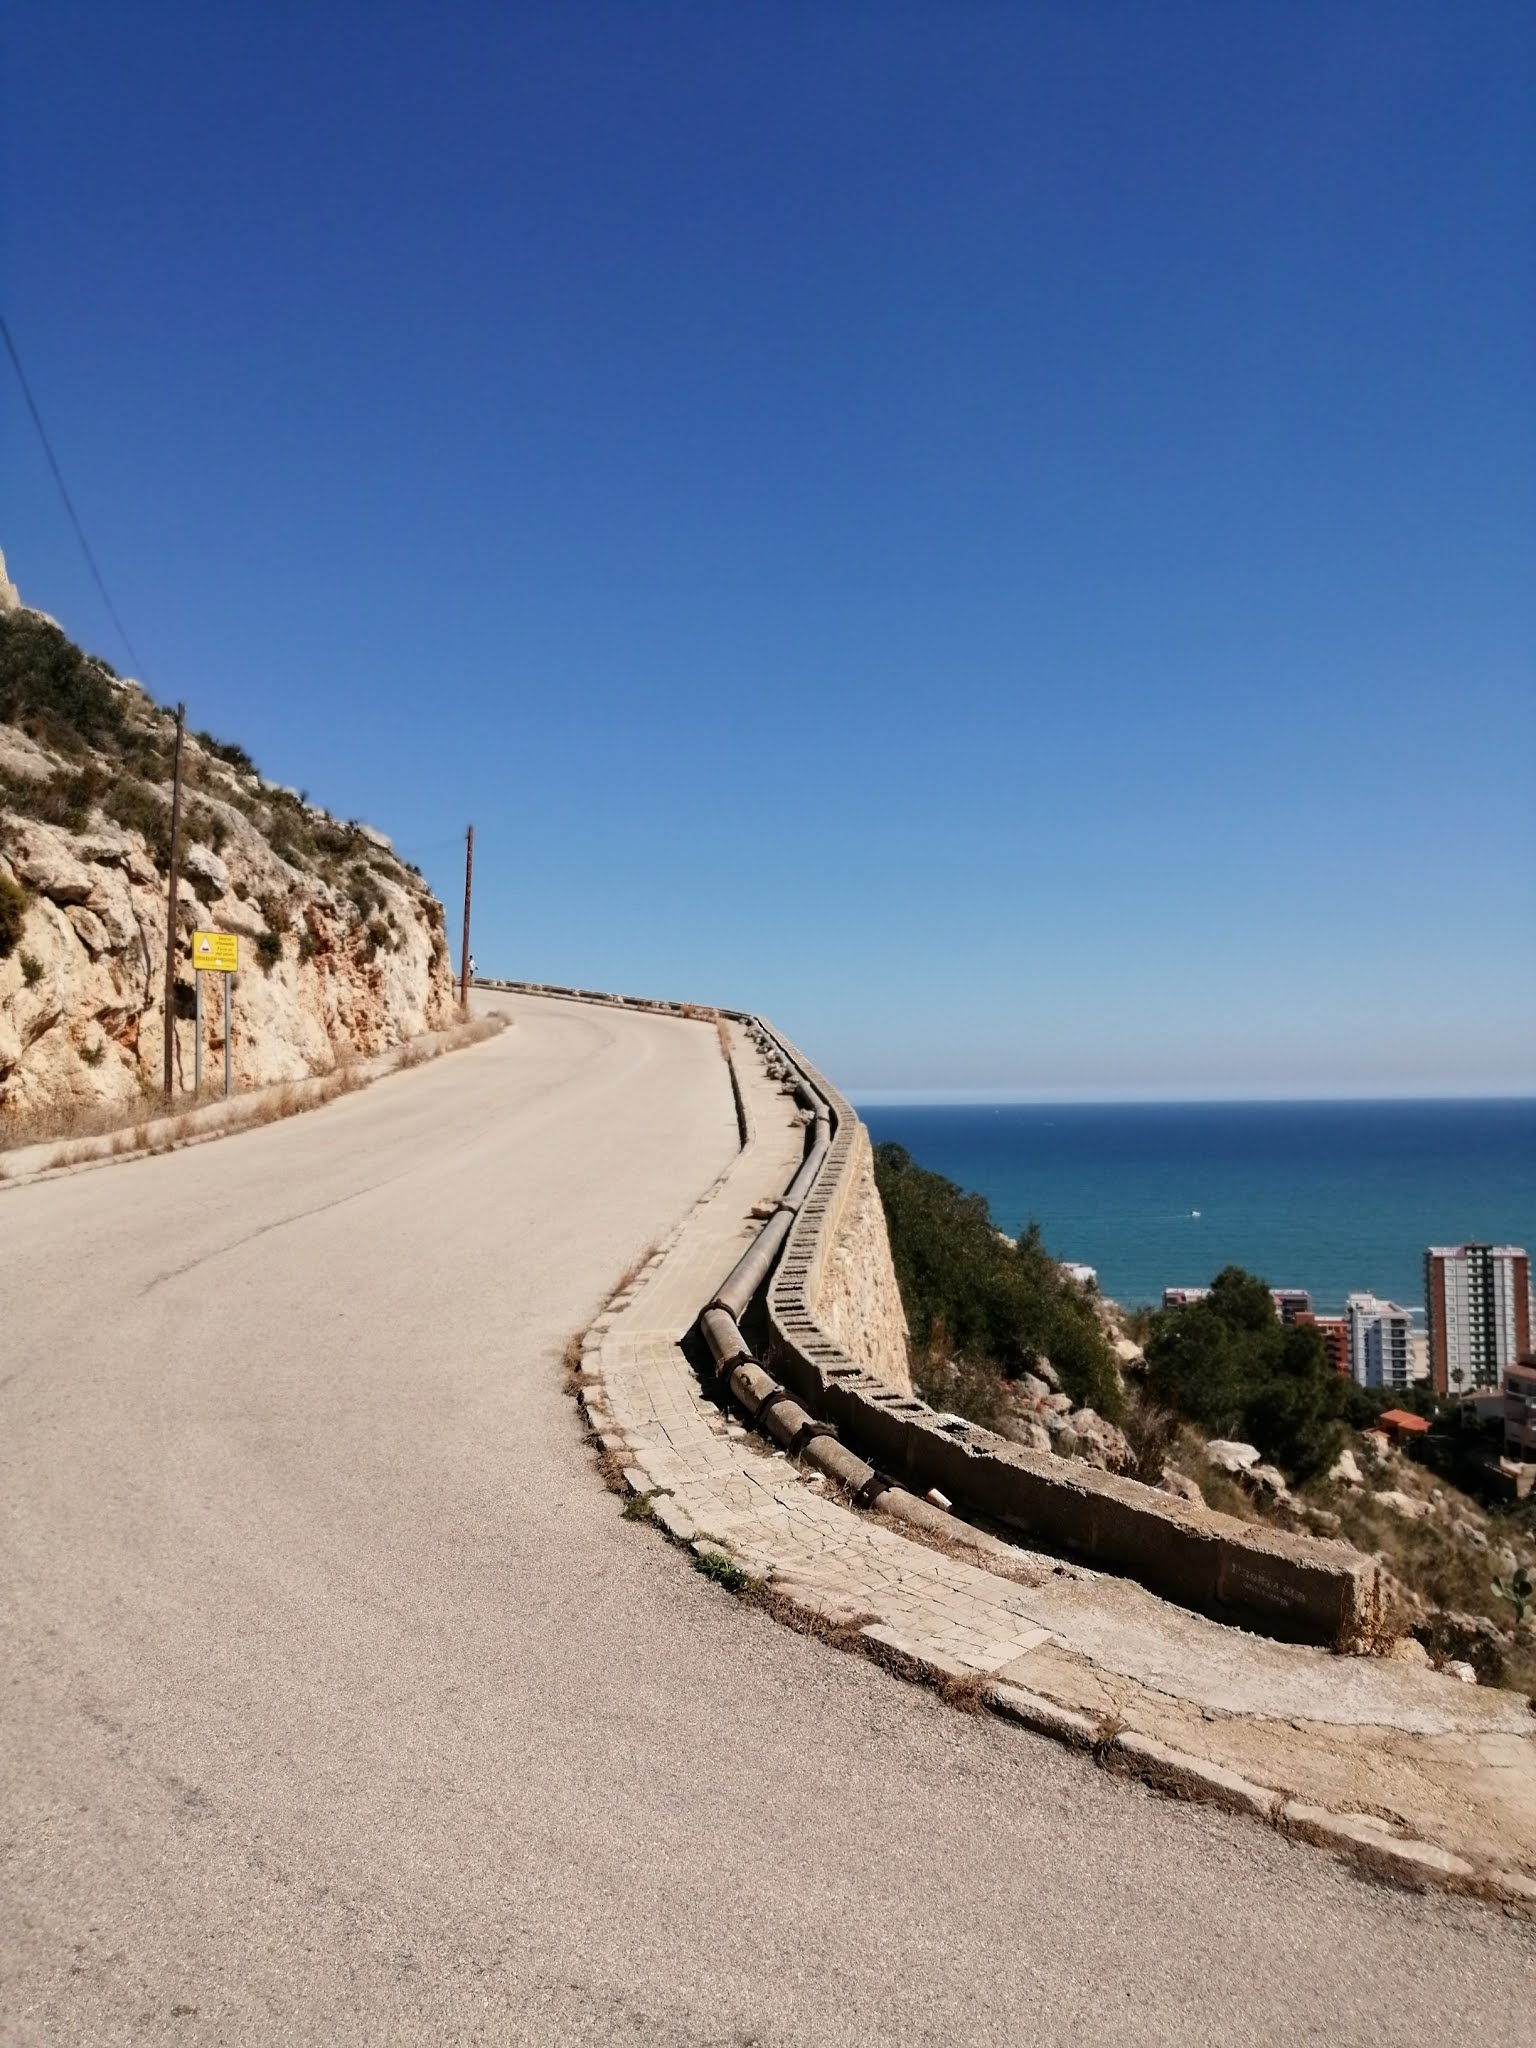 Mediterranean Sea seen from the climb to La Bola in Cullera, Spain